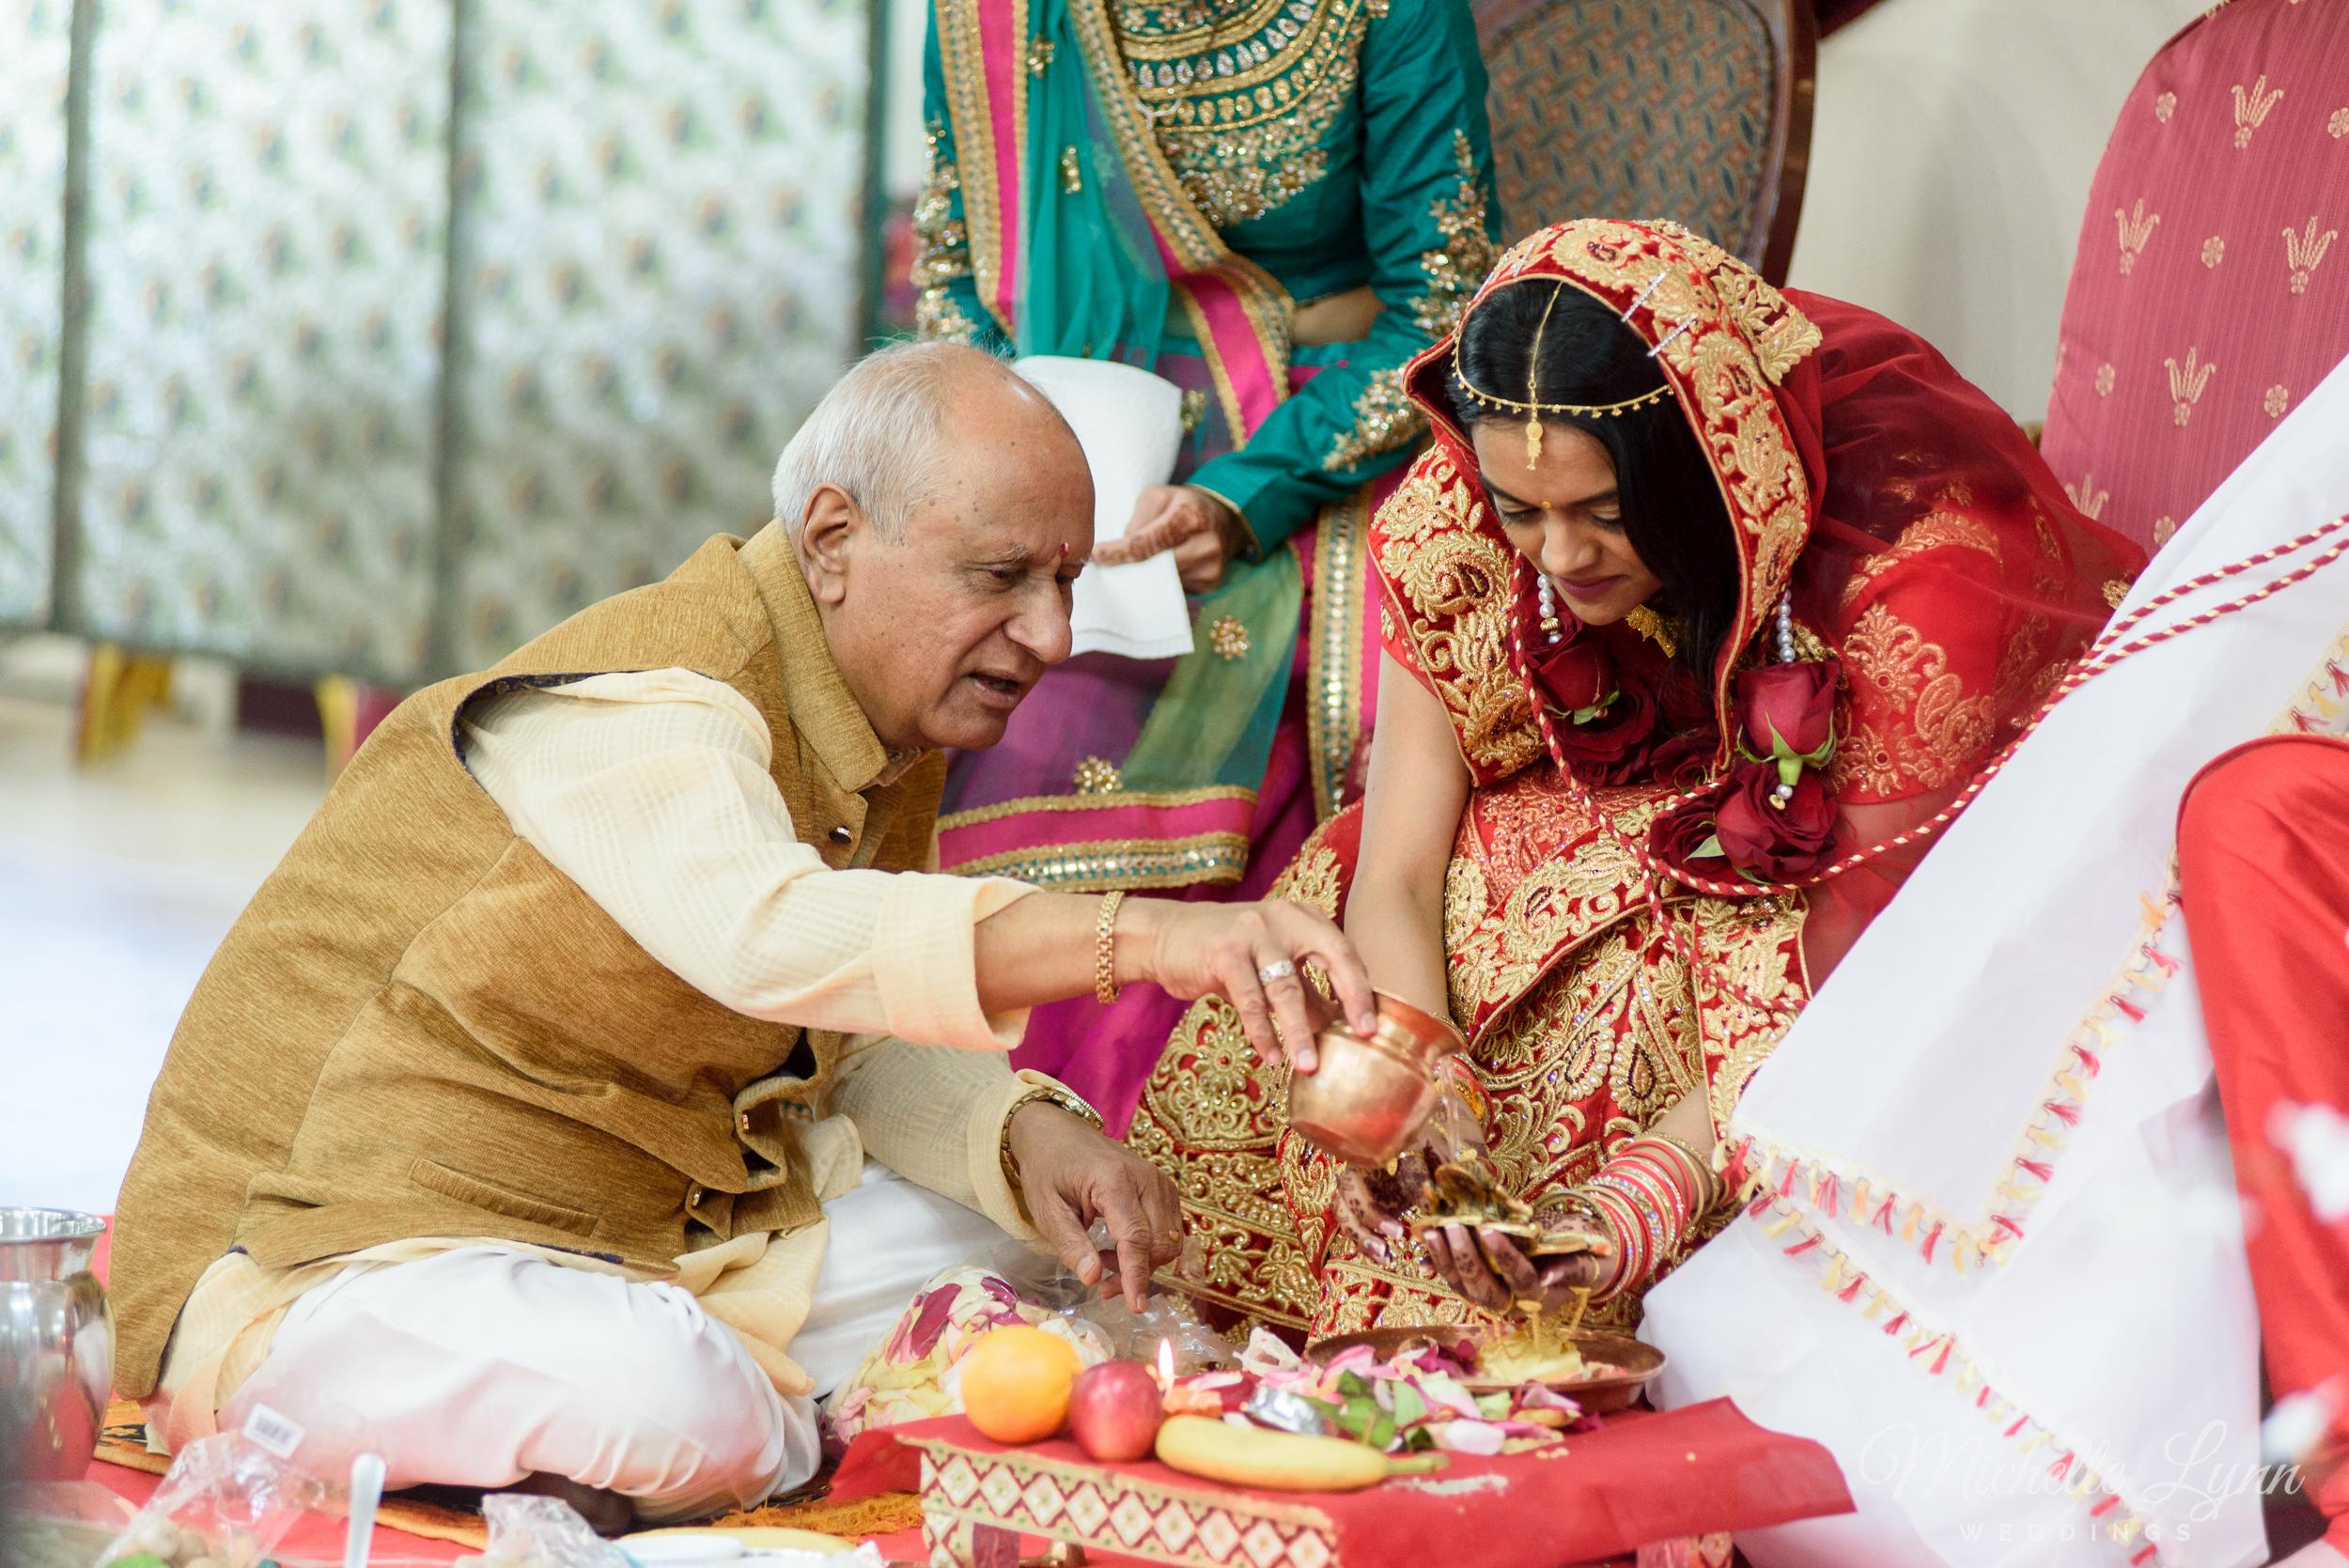 philadelphia-pa-indian-wedding-photographer-ruchi+ryan-31.jpg